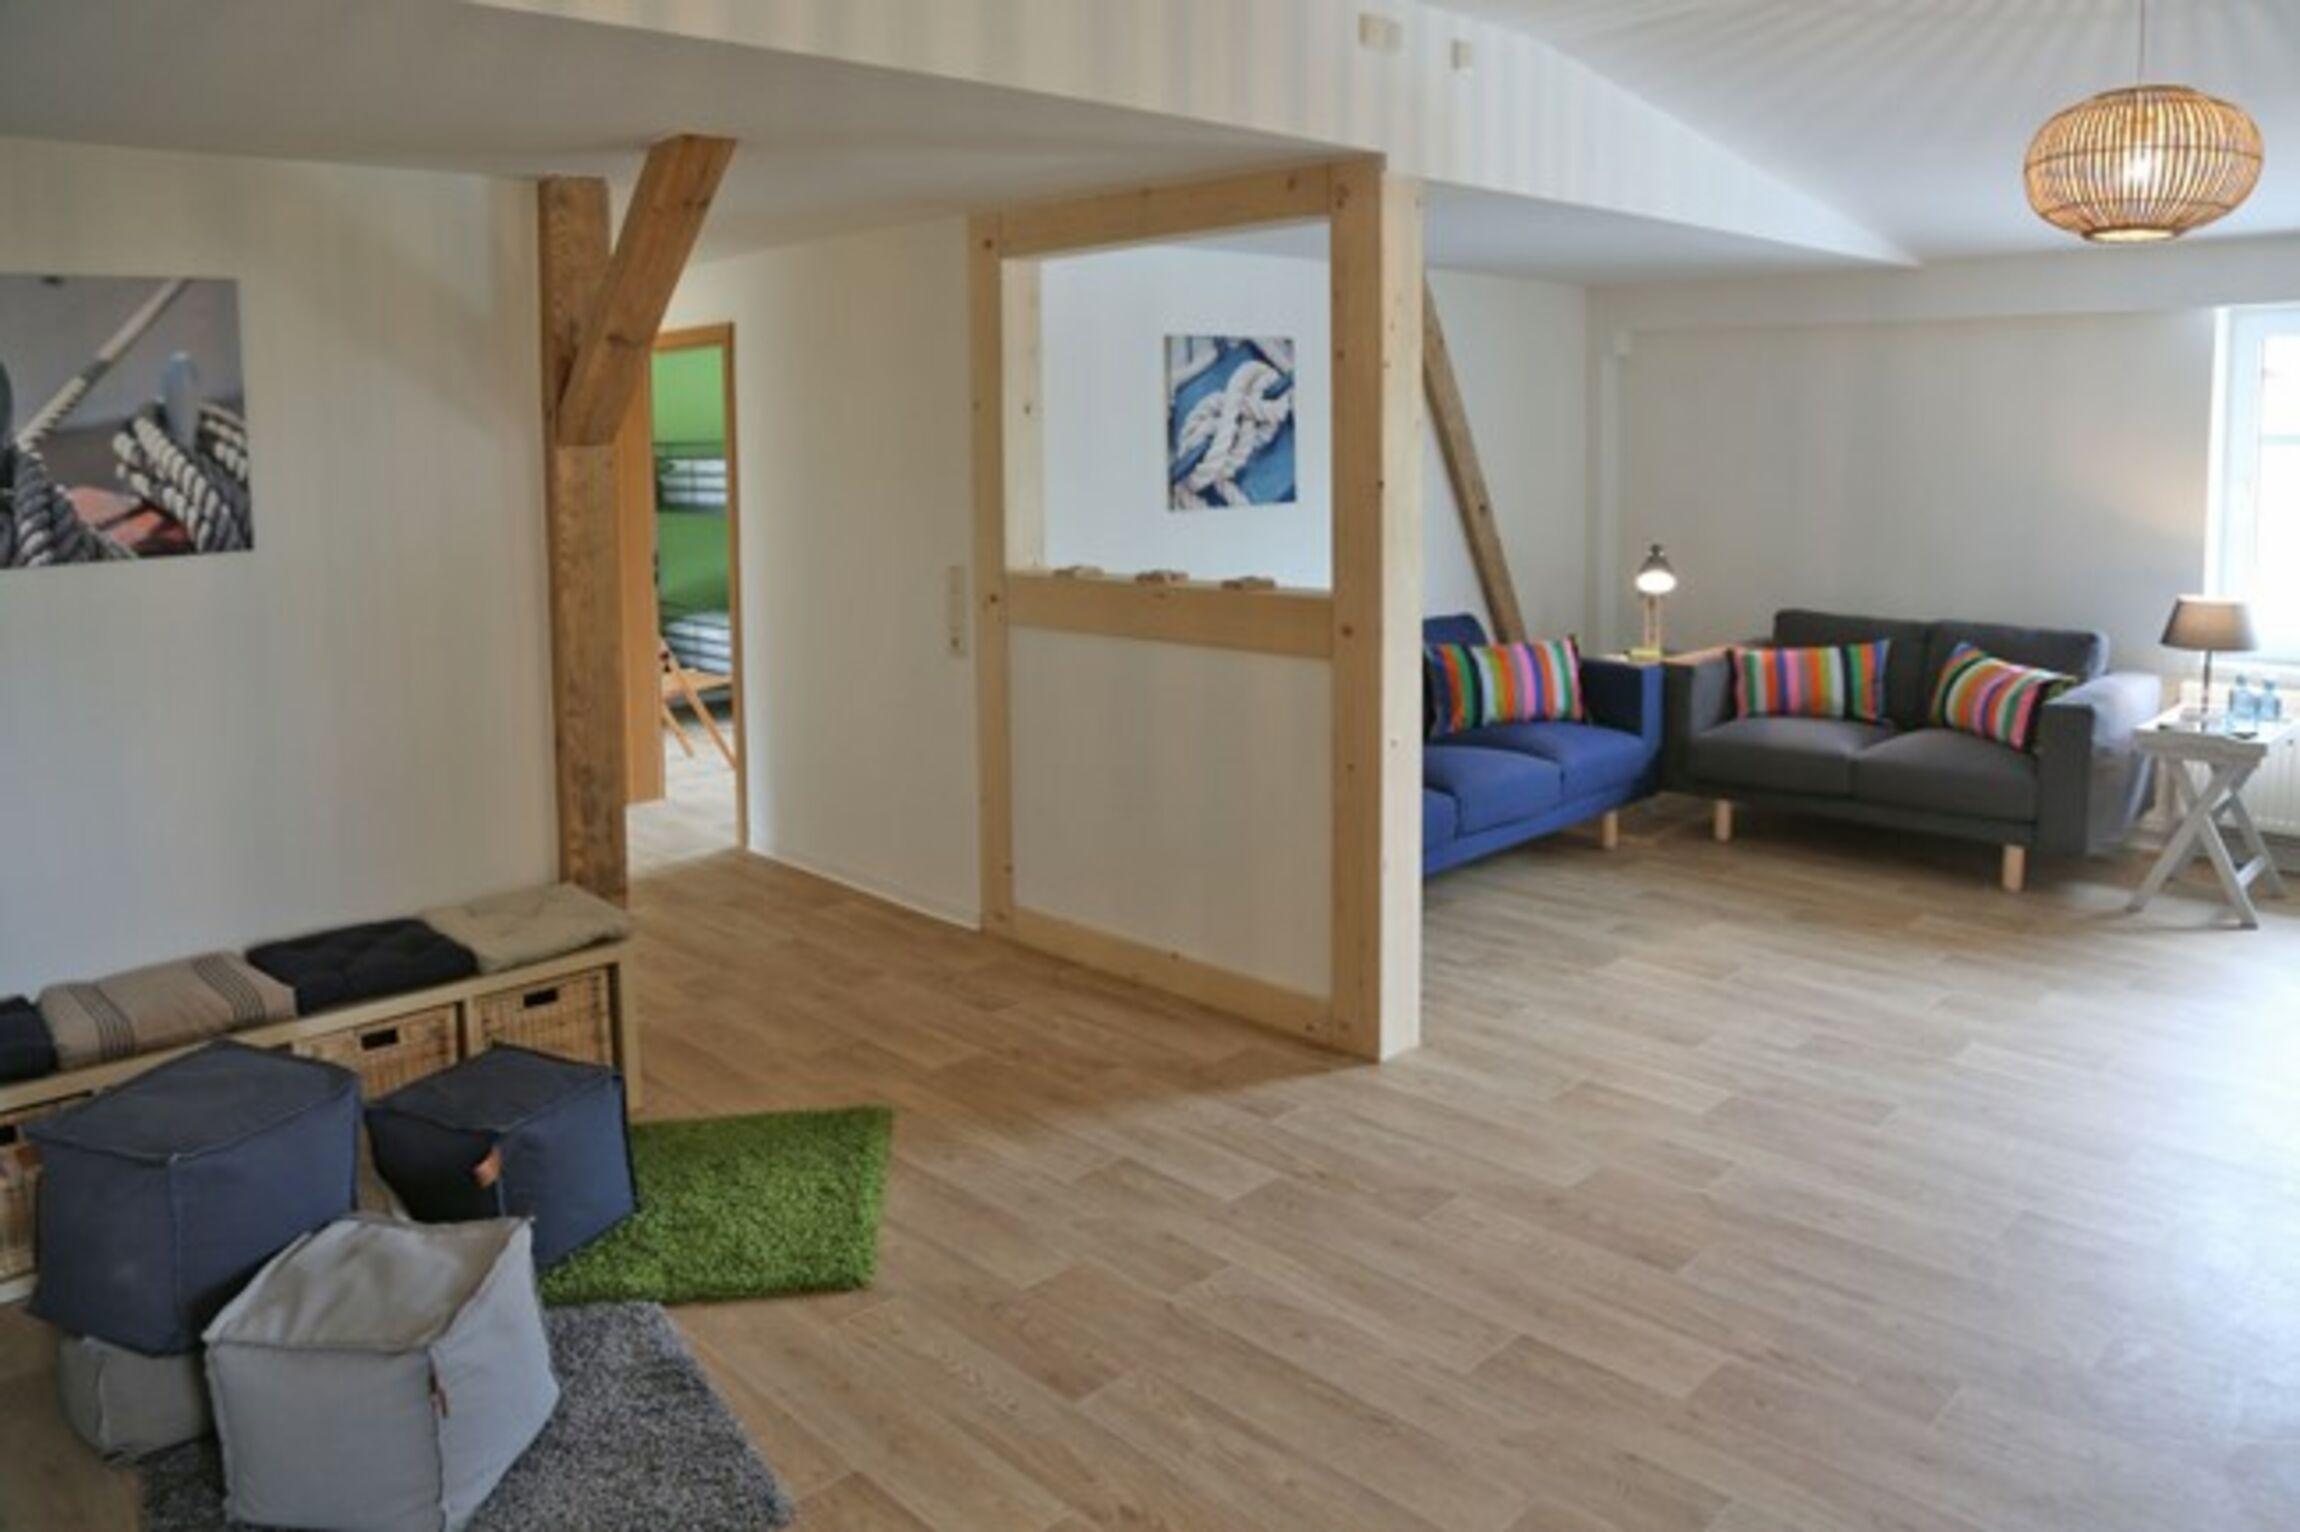 johannes der t ufer kirche wettbergen jugendgruppenleiter. Black Bedroom Furniture Sets. Home Design Ideas